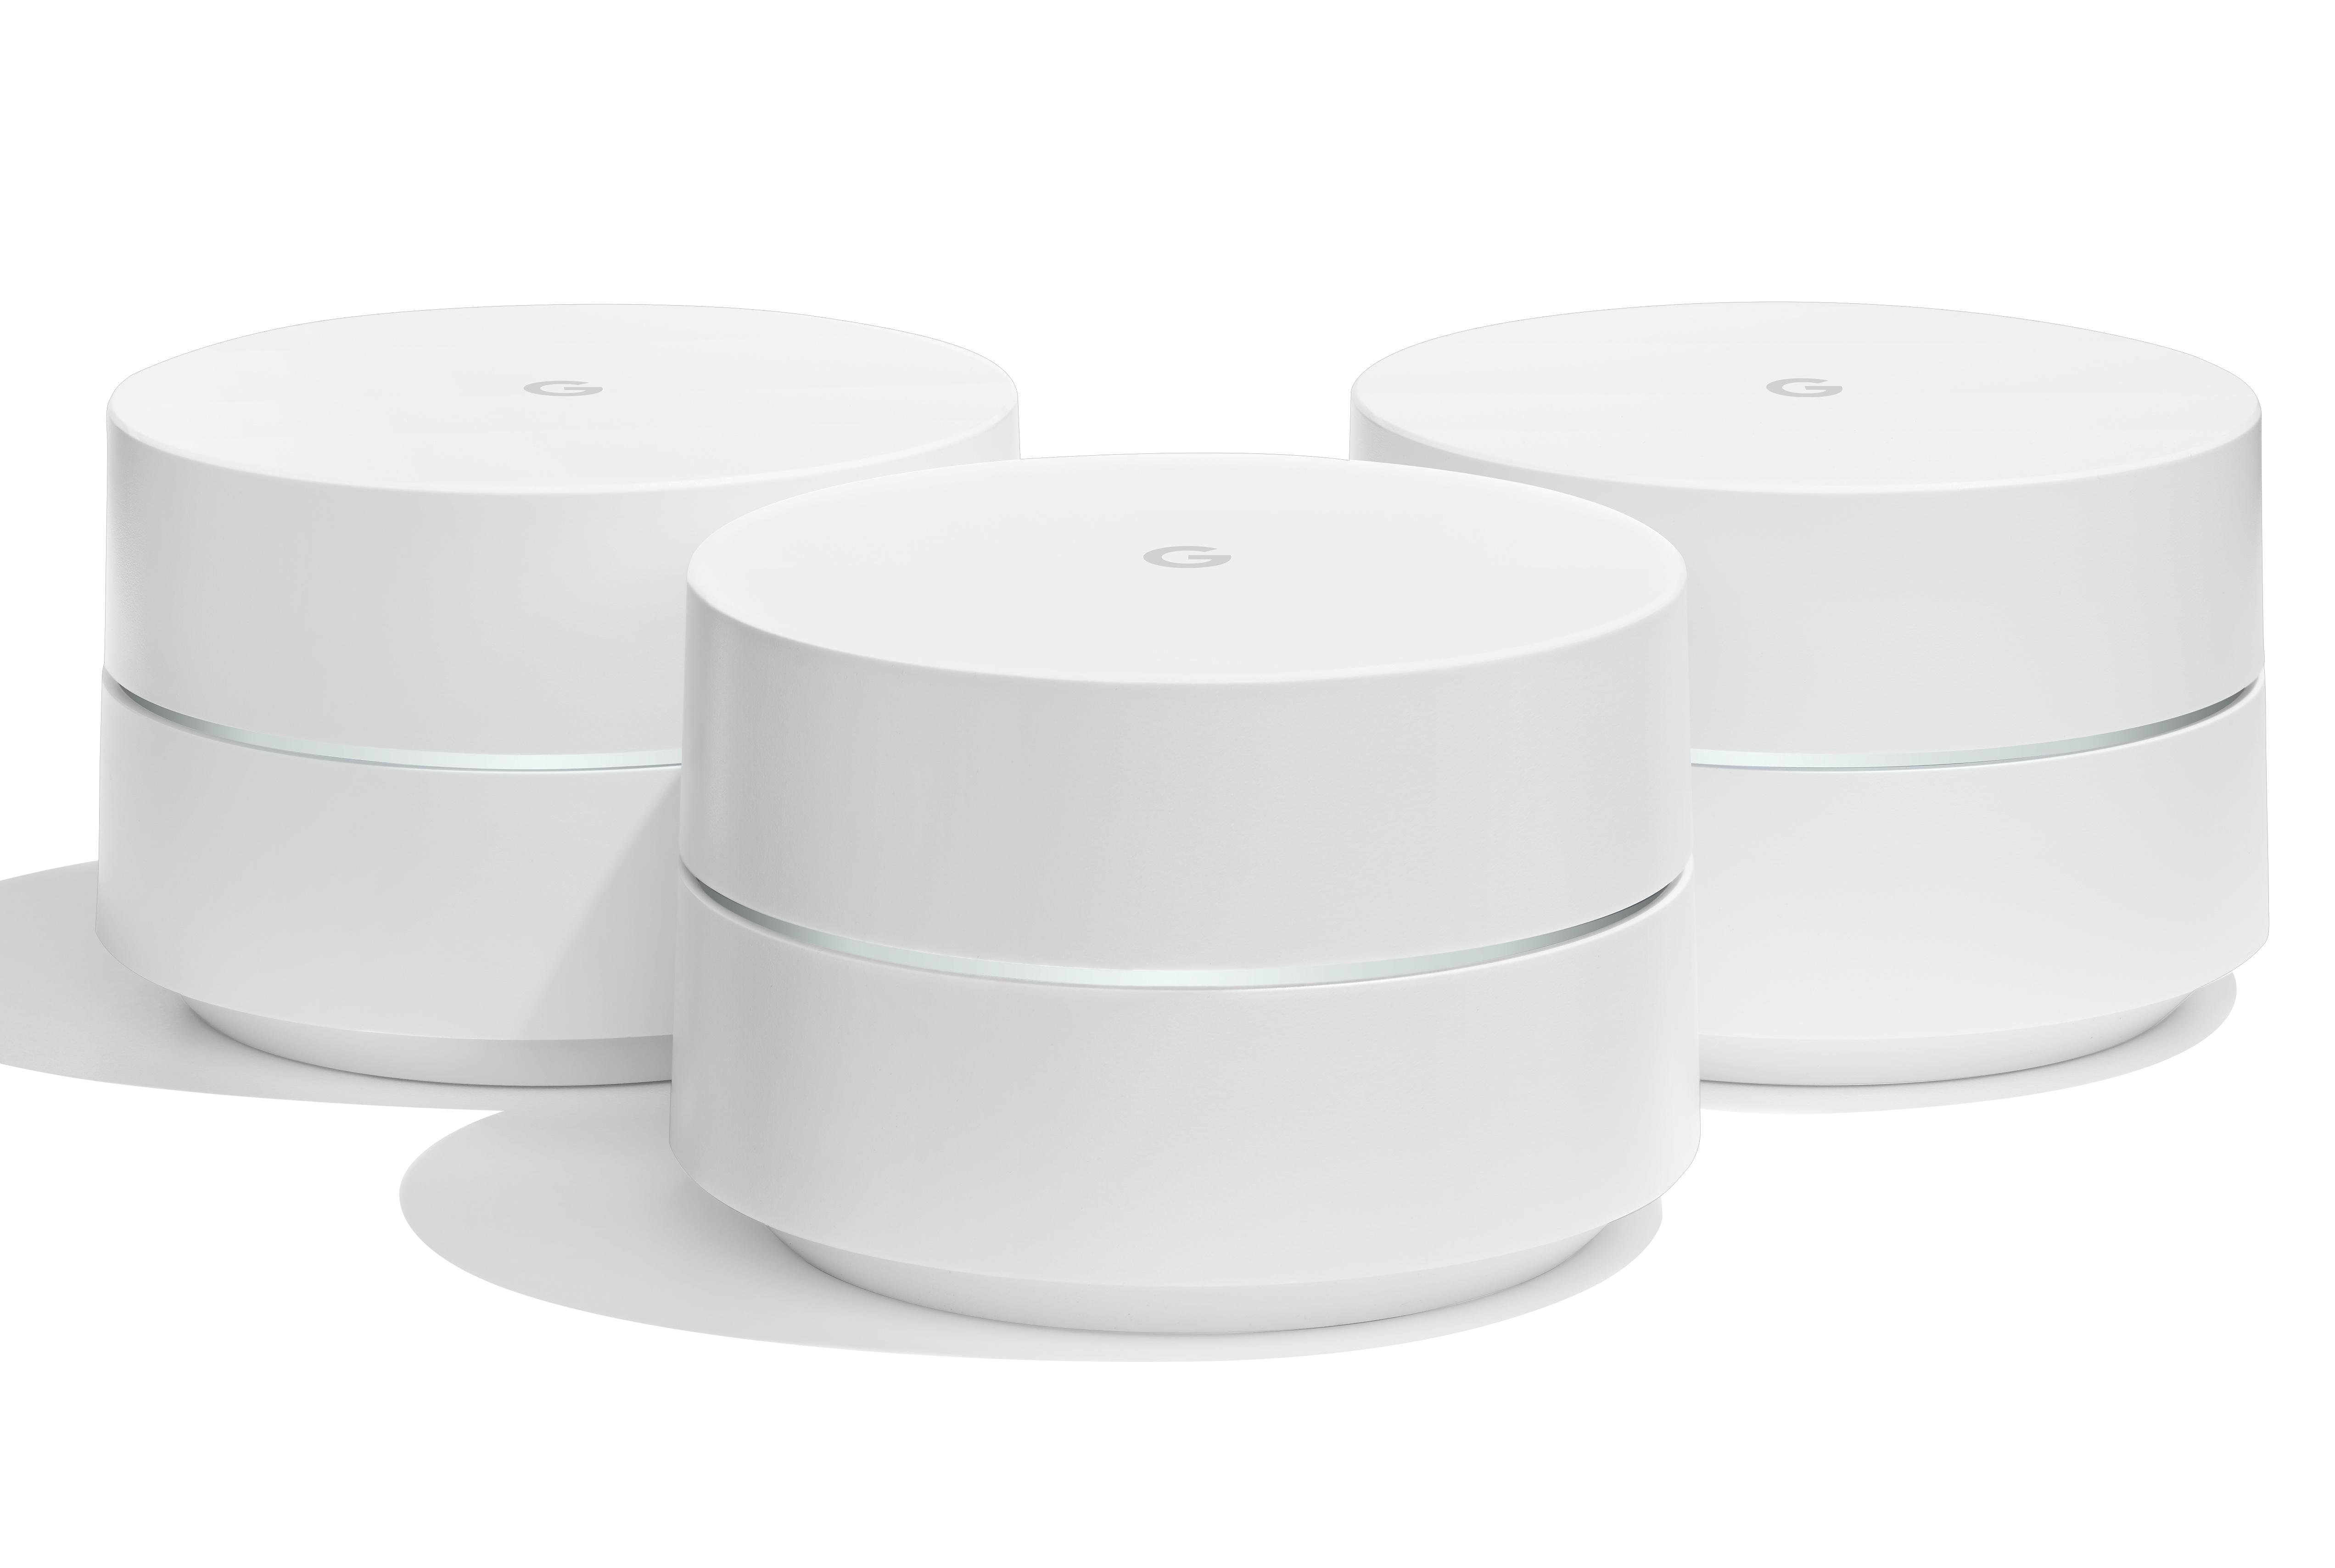 google wifi  3 pack $159 YMMV